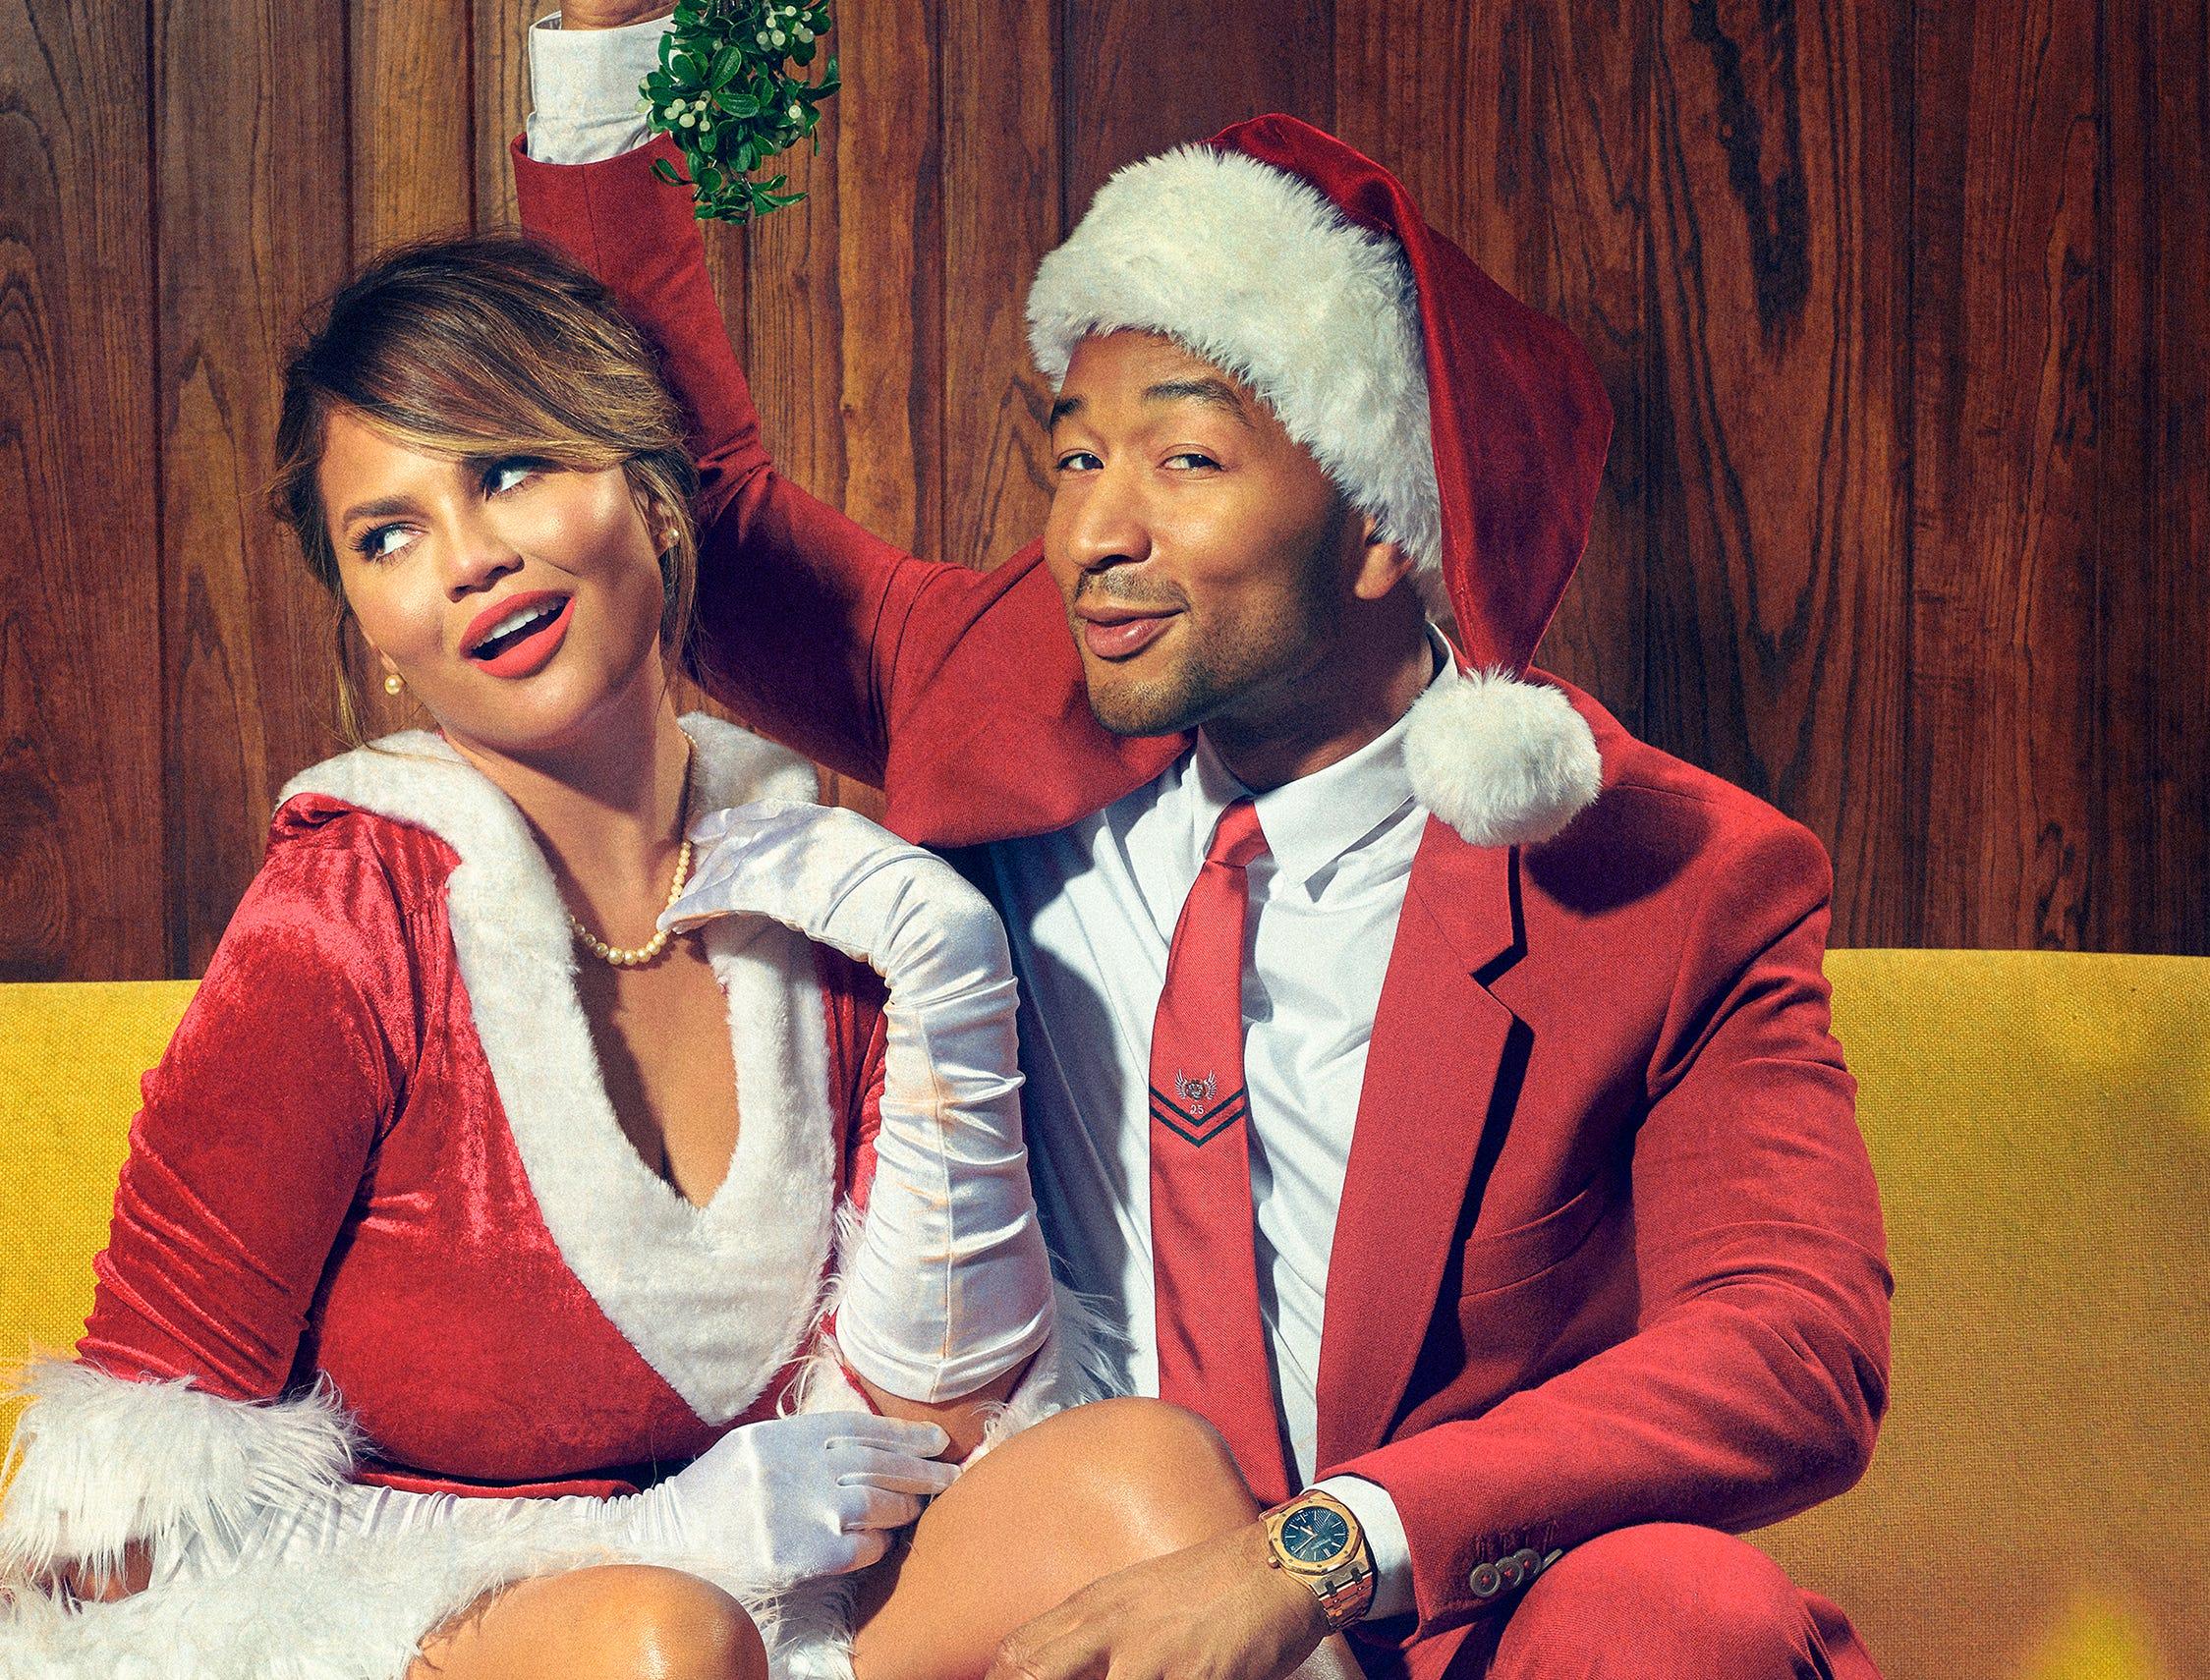 """A Legendary Christmas with John and Chrissy"" (NBC, Nov. 28, 8 EST/PST)"